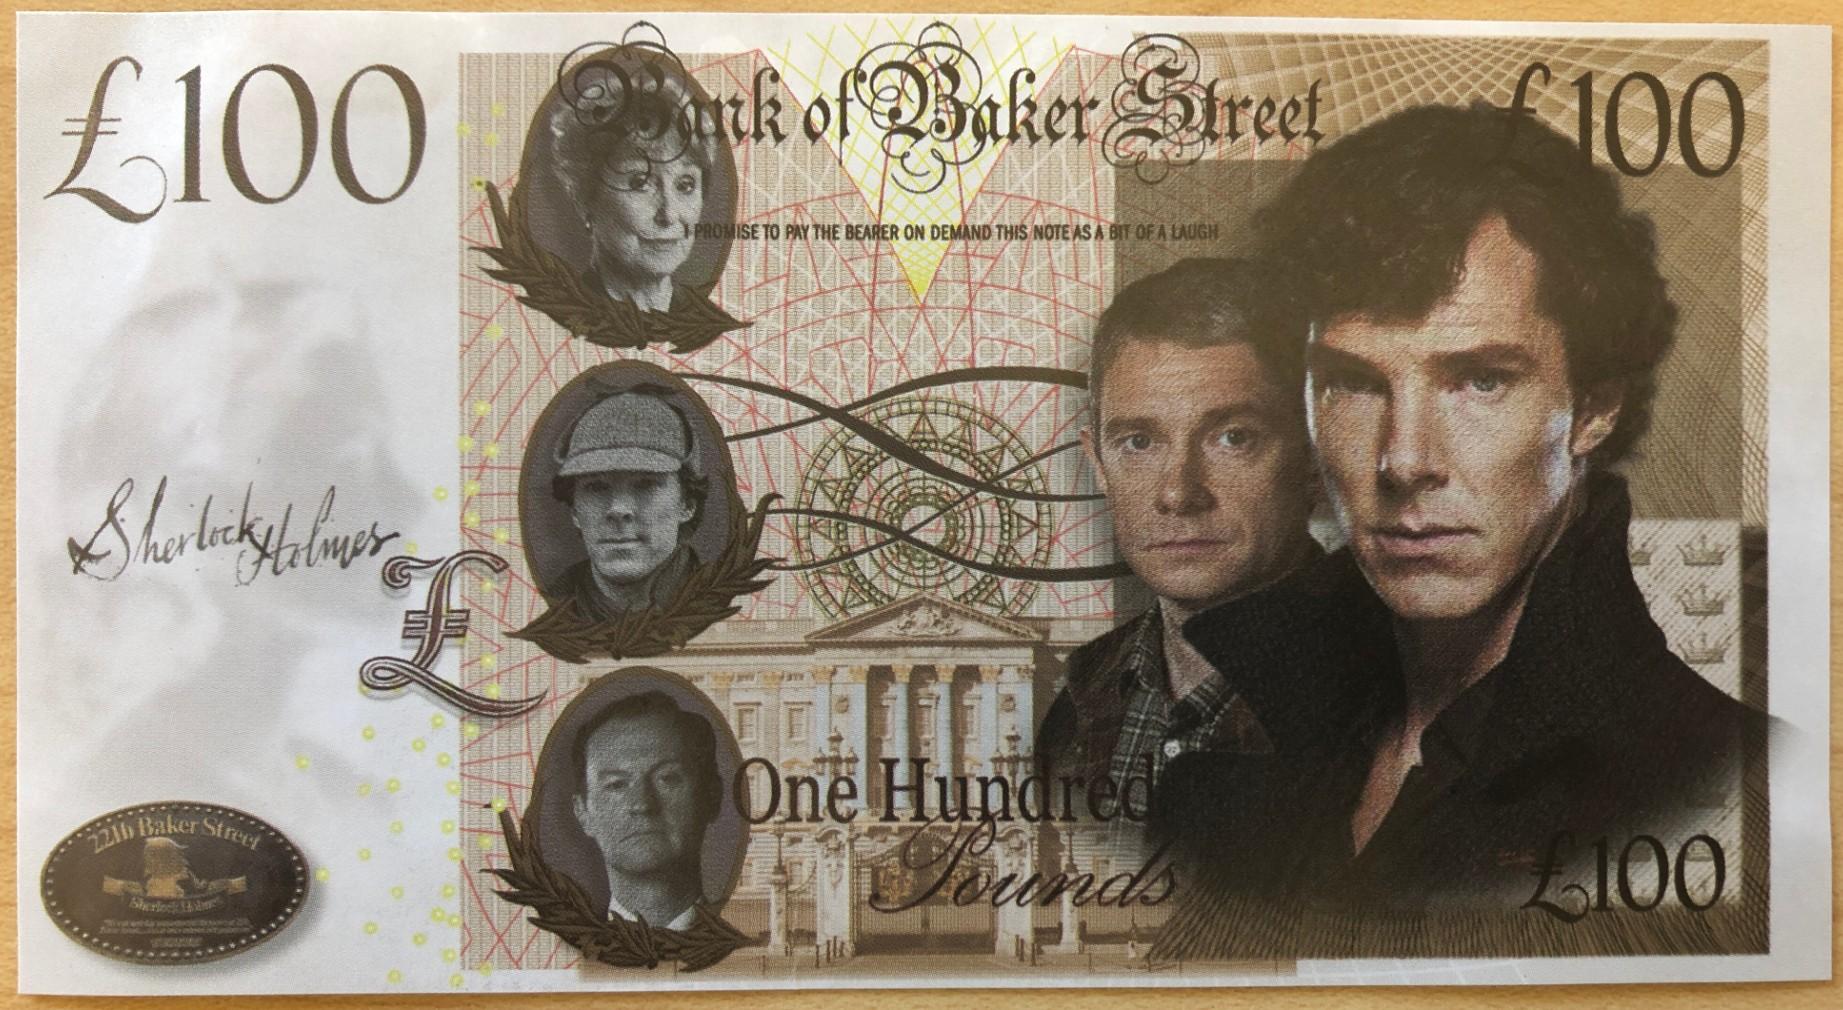 Fantasy £100 Bank of Baker Street Notes Feature BBC Sherlock Cast